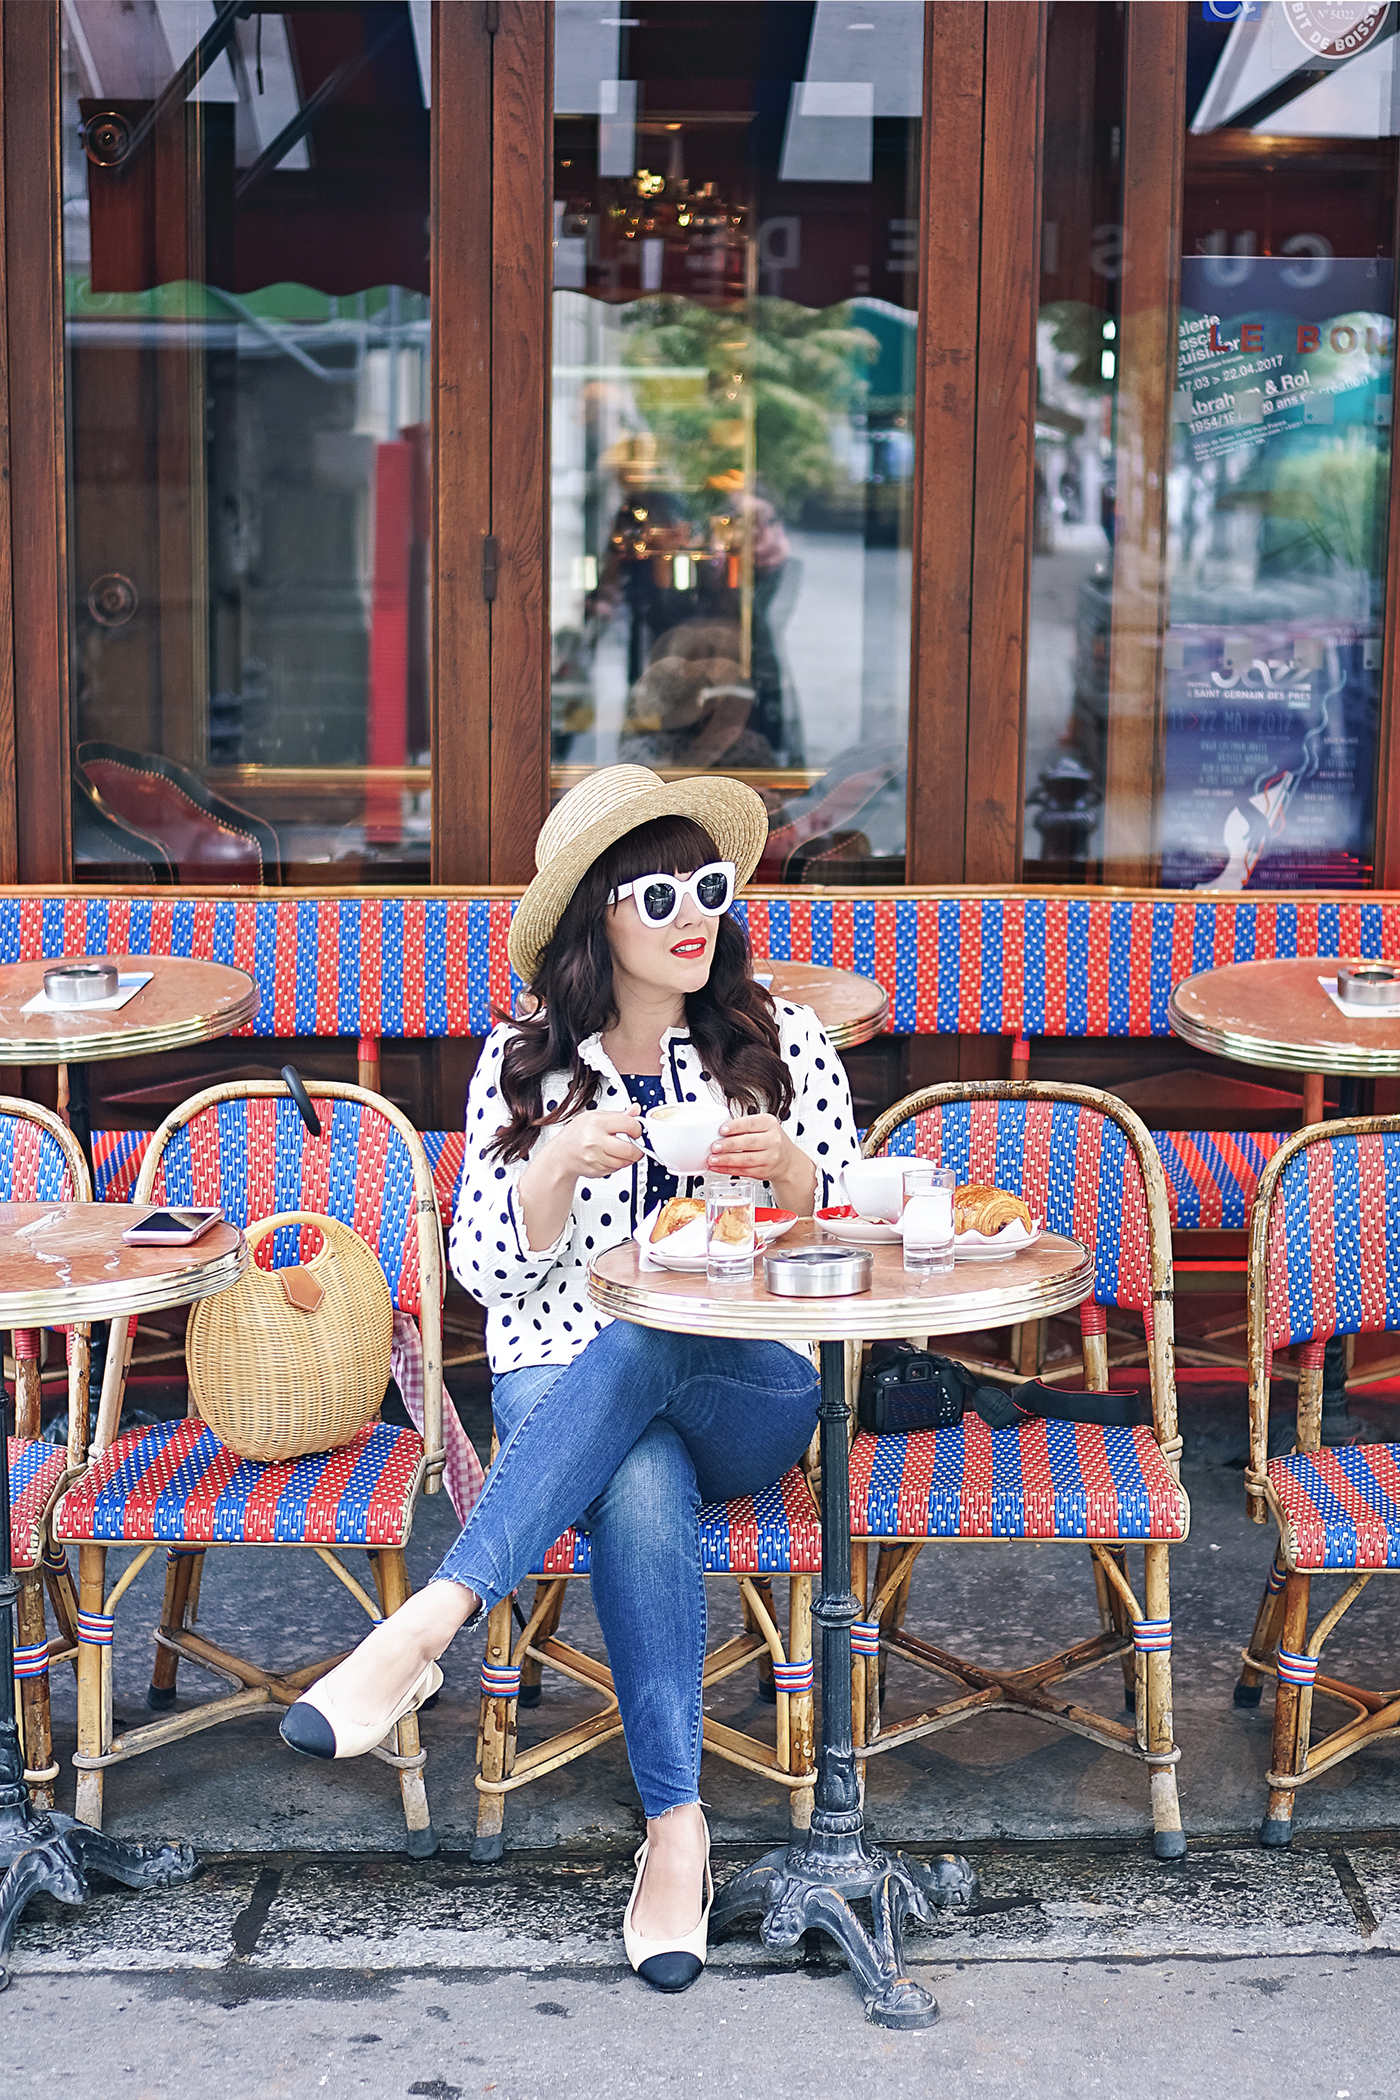 10 Great Cafes in Paris